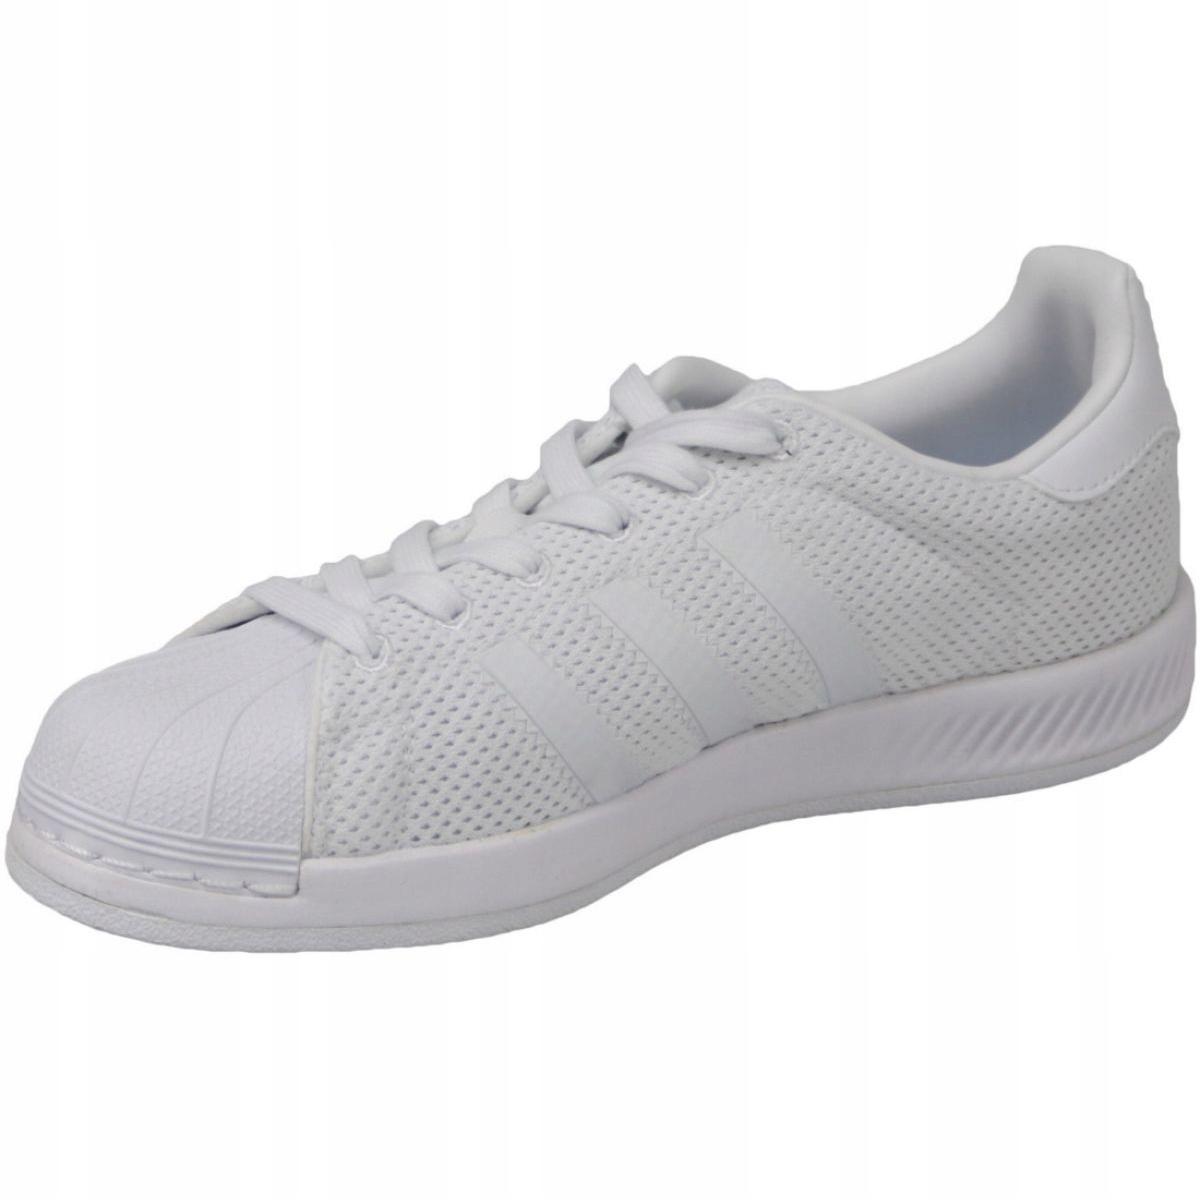 By Adidas Schuhe Weiß By1589 Bounce Px8kn0won Superstar 4LA5Rj